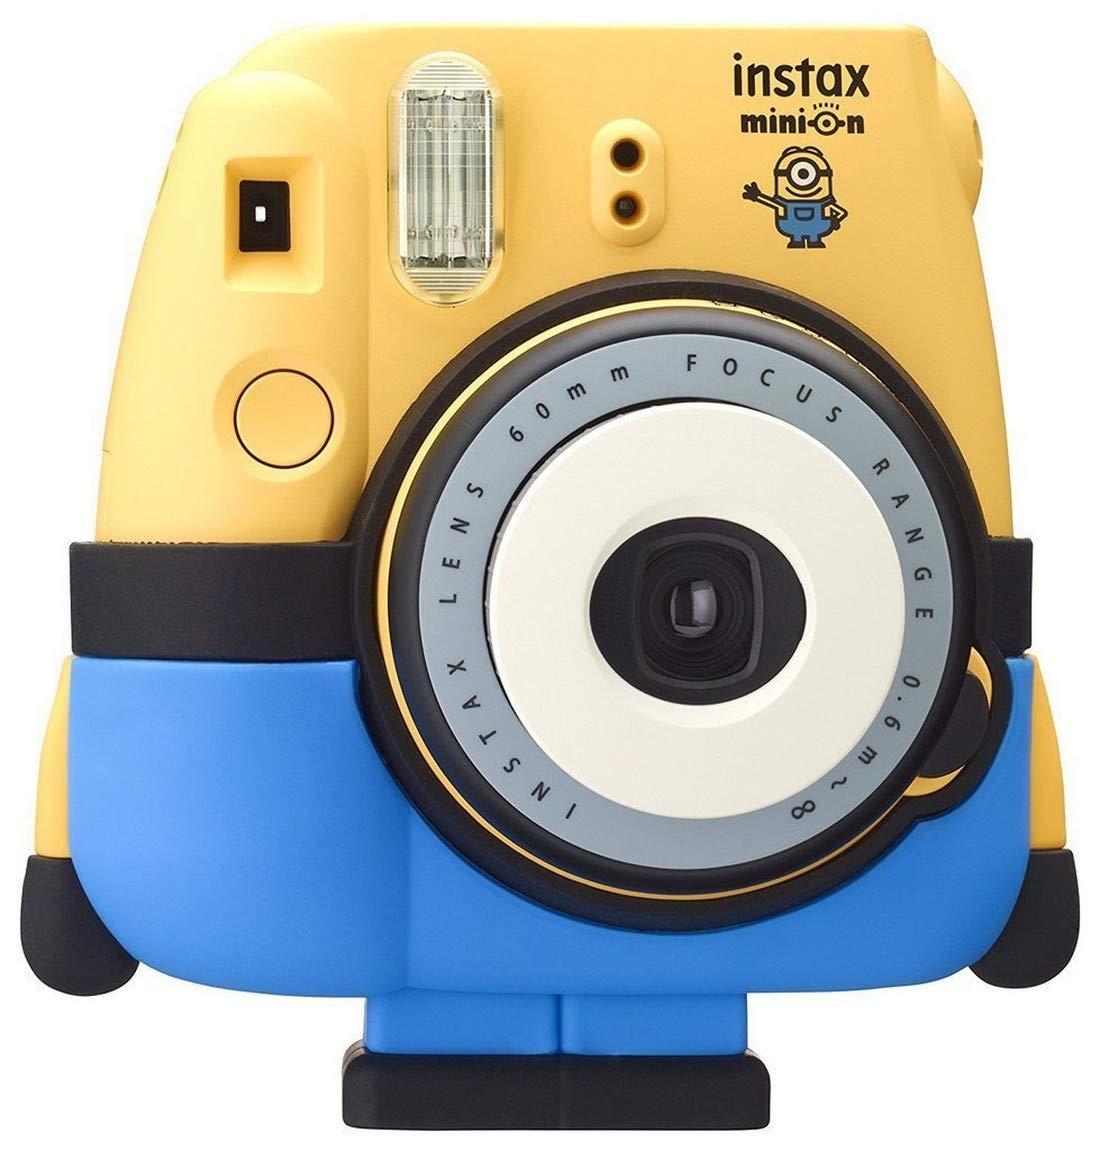 d6d7a37b6c4fcd Fujifilm Instax Mini 8 Minion Appareil photo instantané Jaune Bleu   Amazon.fr  Photo   Caméscopes